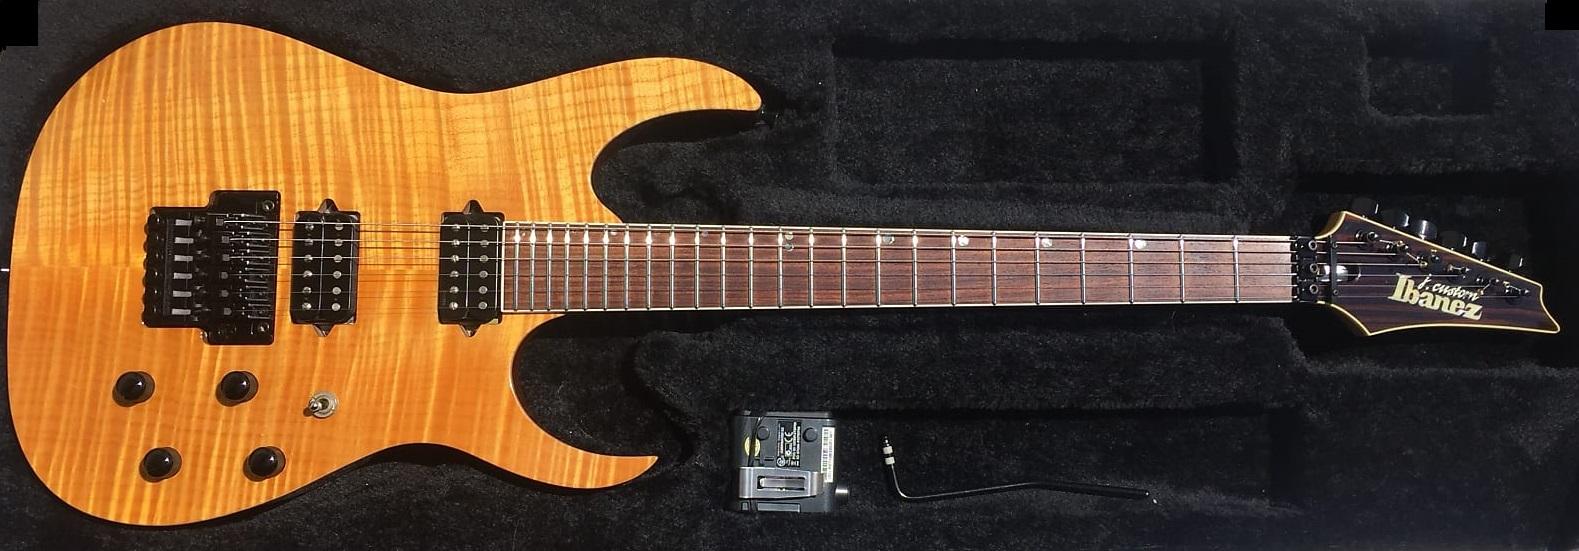 RG8520 (2001–2002)